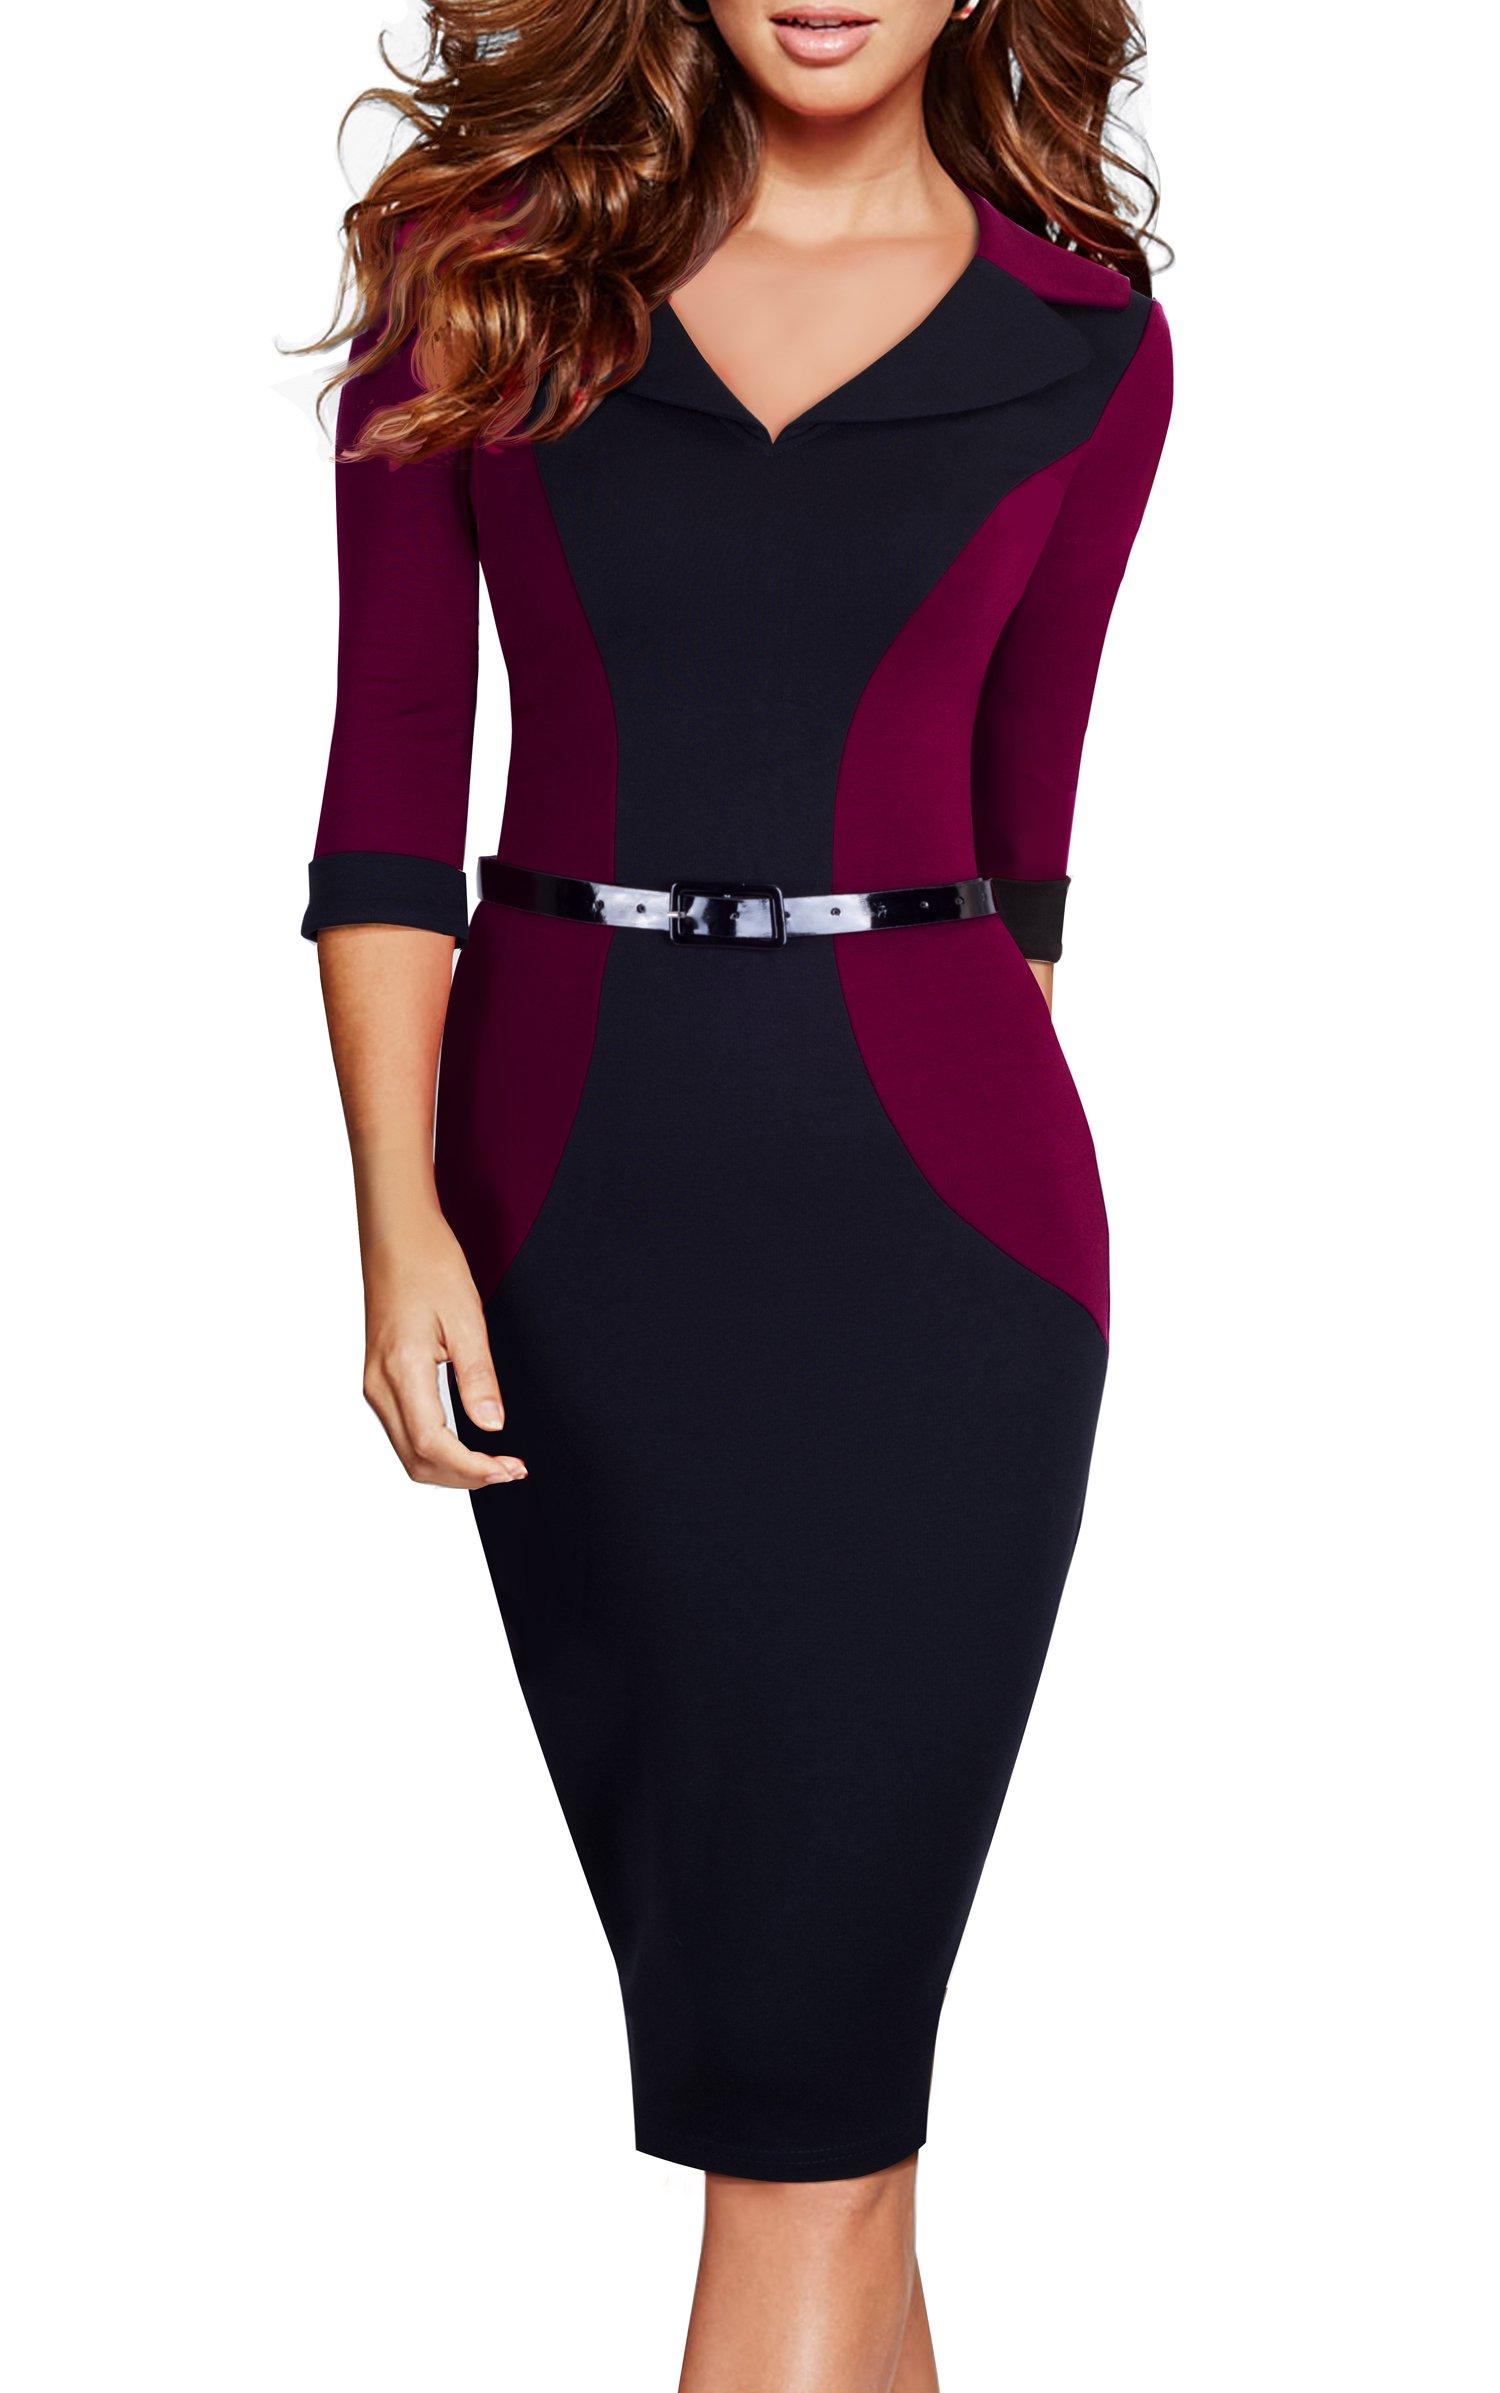 HOMEYEE Women's V-Neck Patchwork 3/4 Sleeve Wear to Work Pencil Dress B354